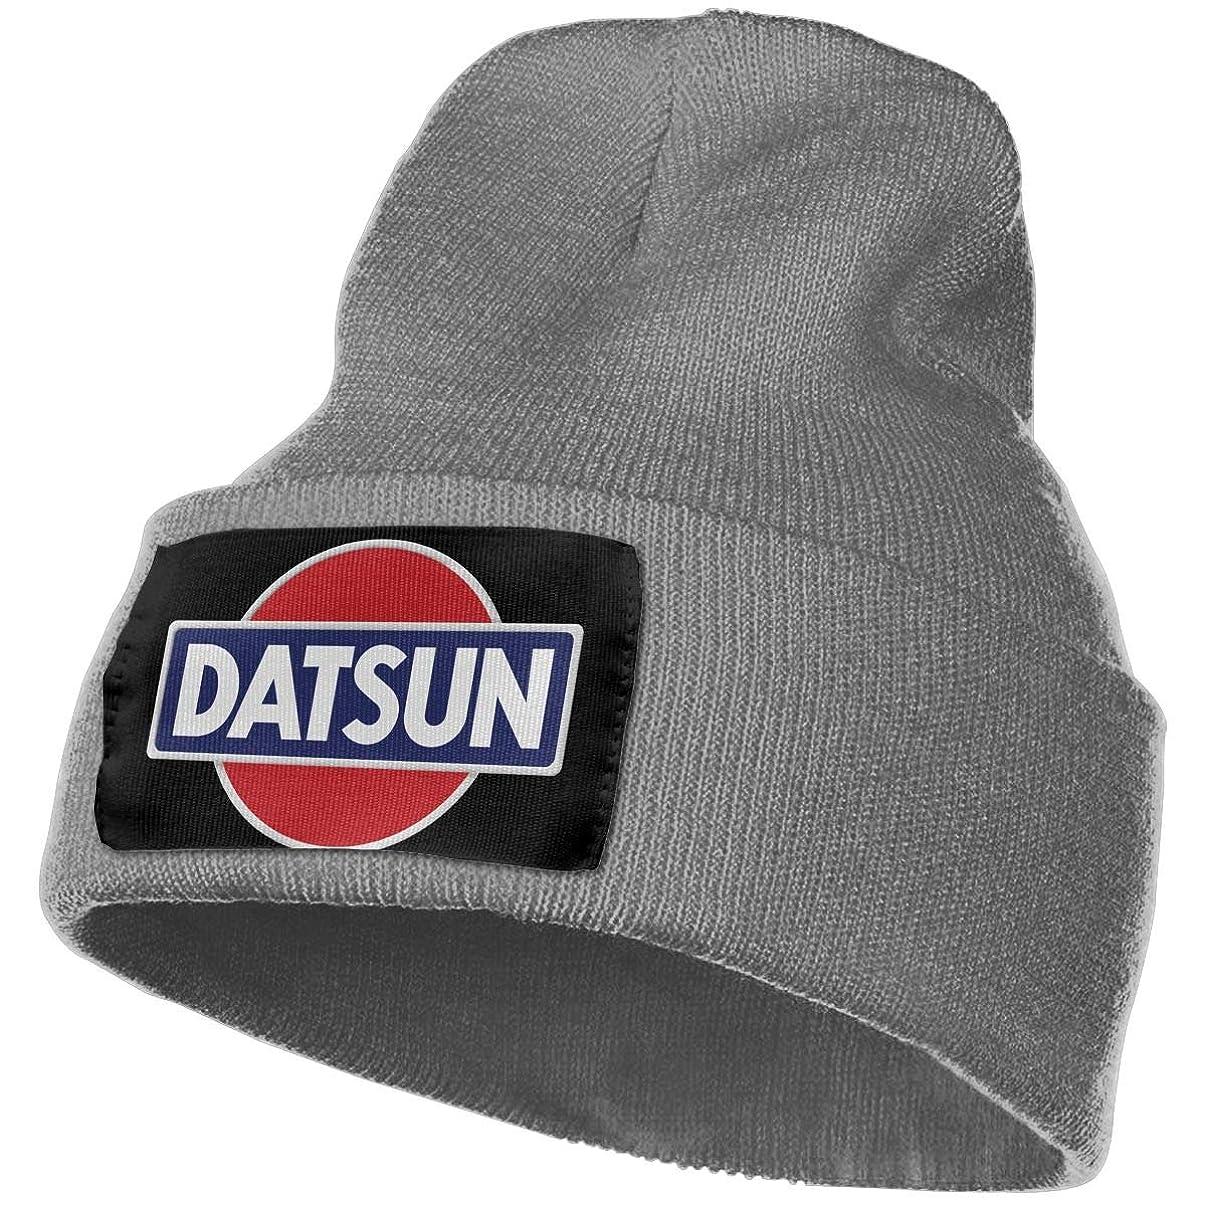 MACA Datsun Emblem Car Logo Unisex Slouch Beanie Hats - Thick, Warm & Stylish Winter Hats Black